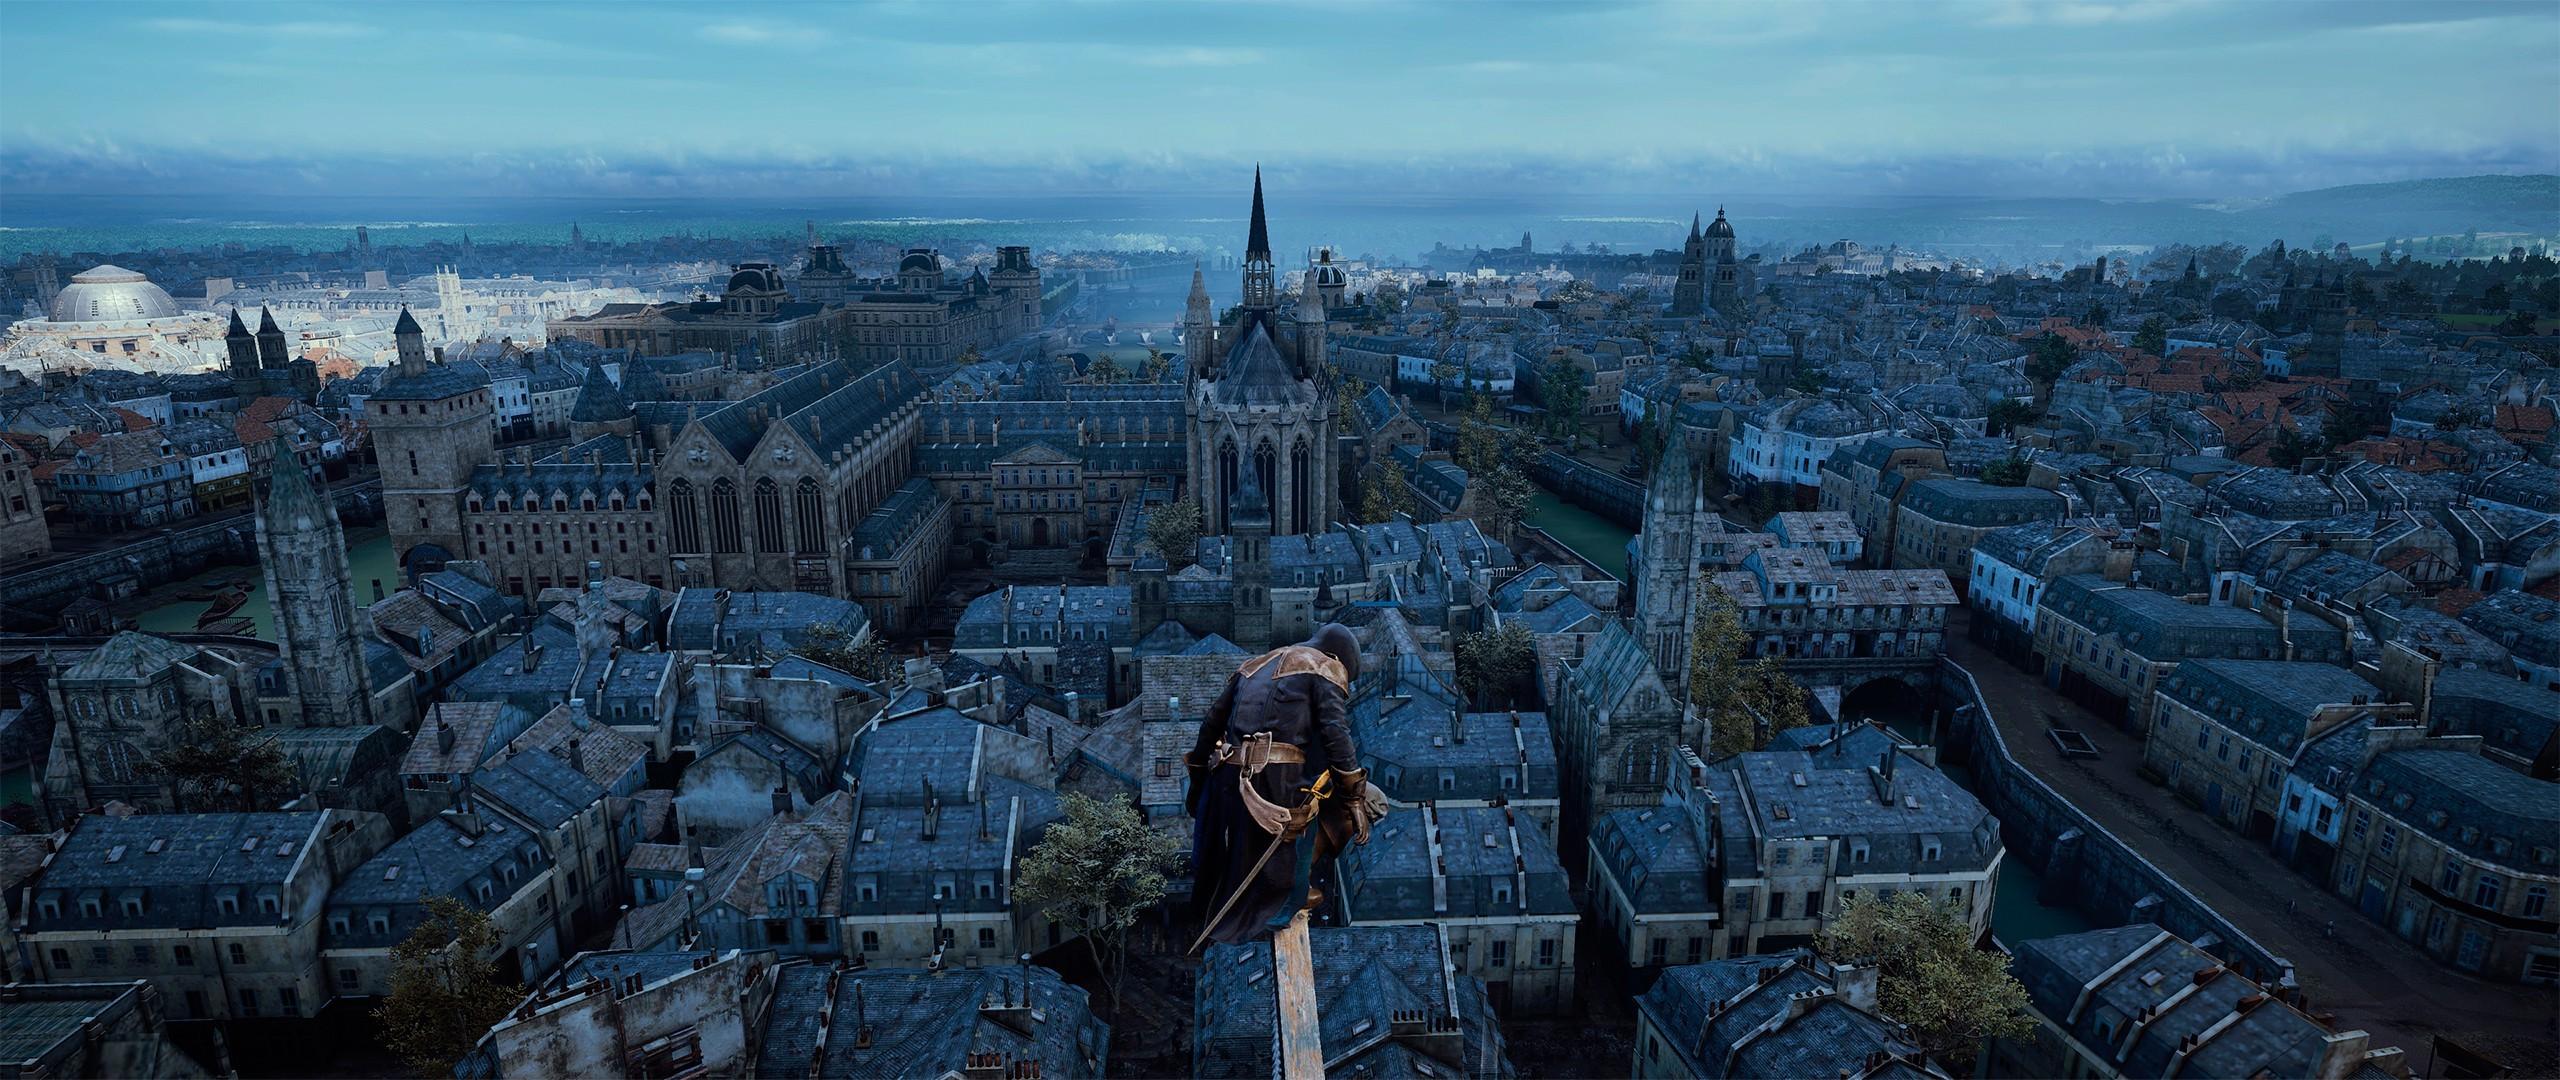 2560x1080 Playerunknowns Battlegrounds 2017 Game 2560x1080: 배경 화면 : 2560x1080 Px, Assassins Creed Unity, 비디오 게임